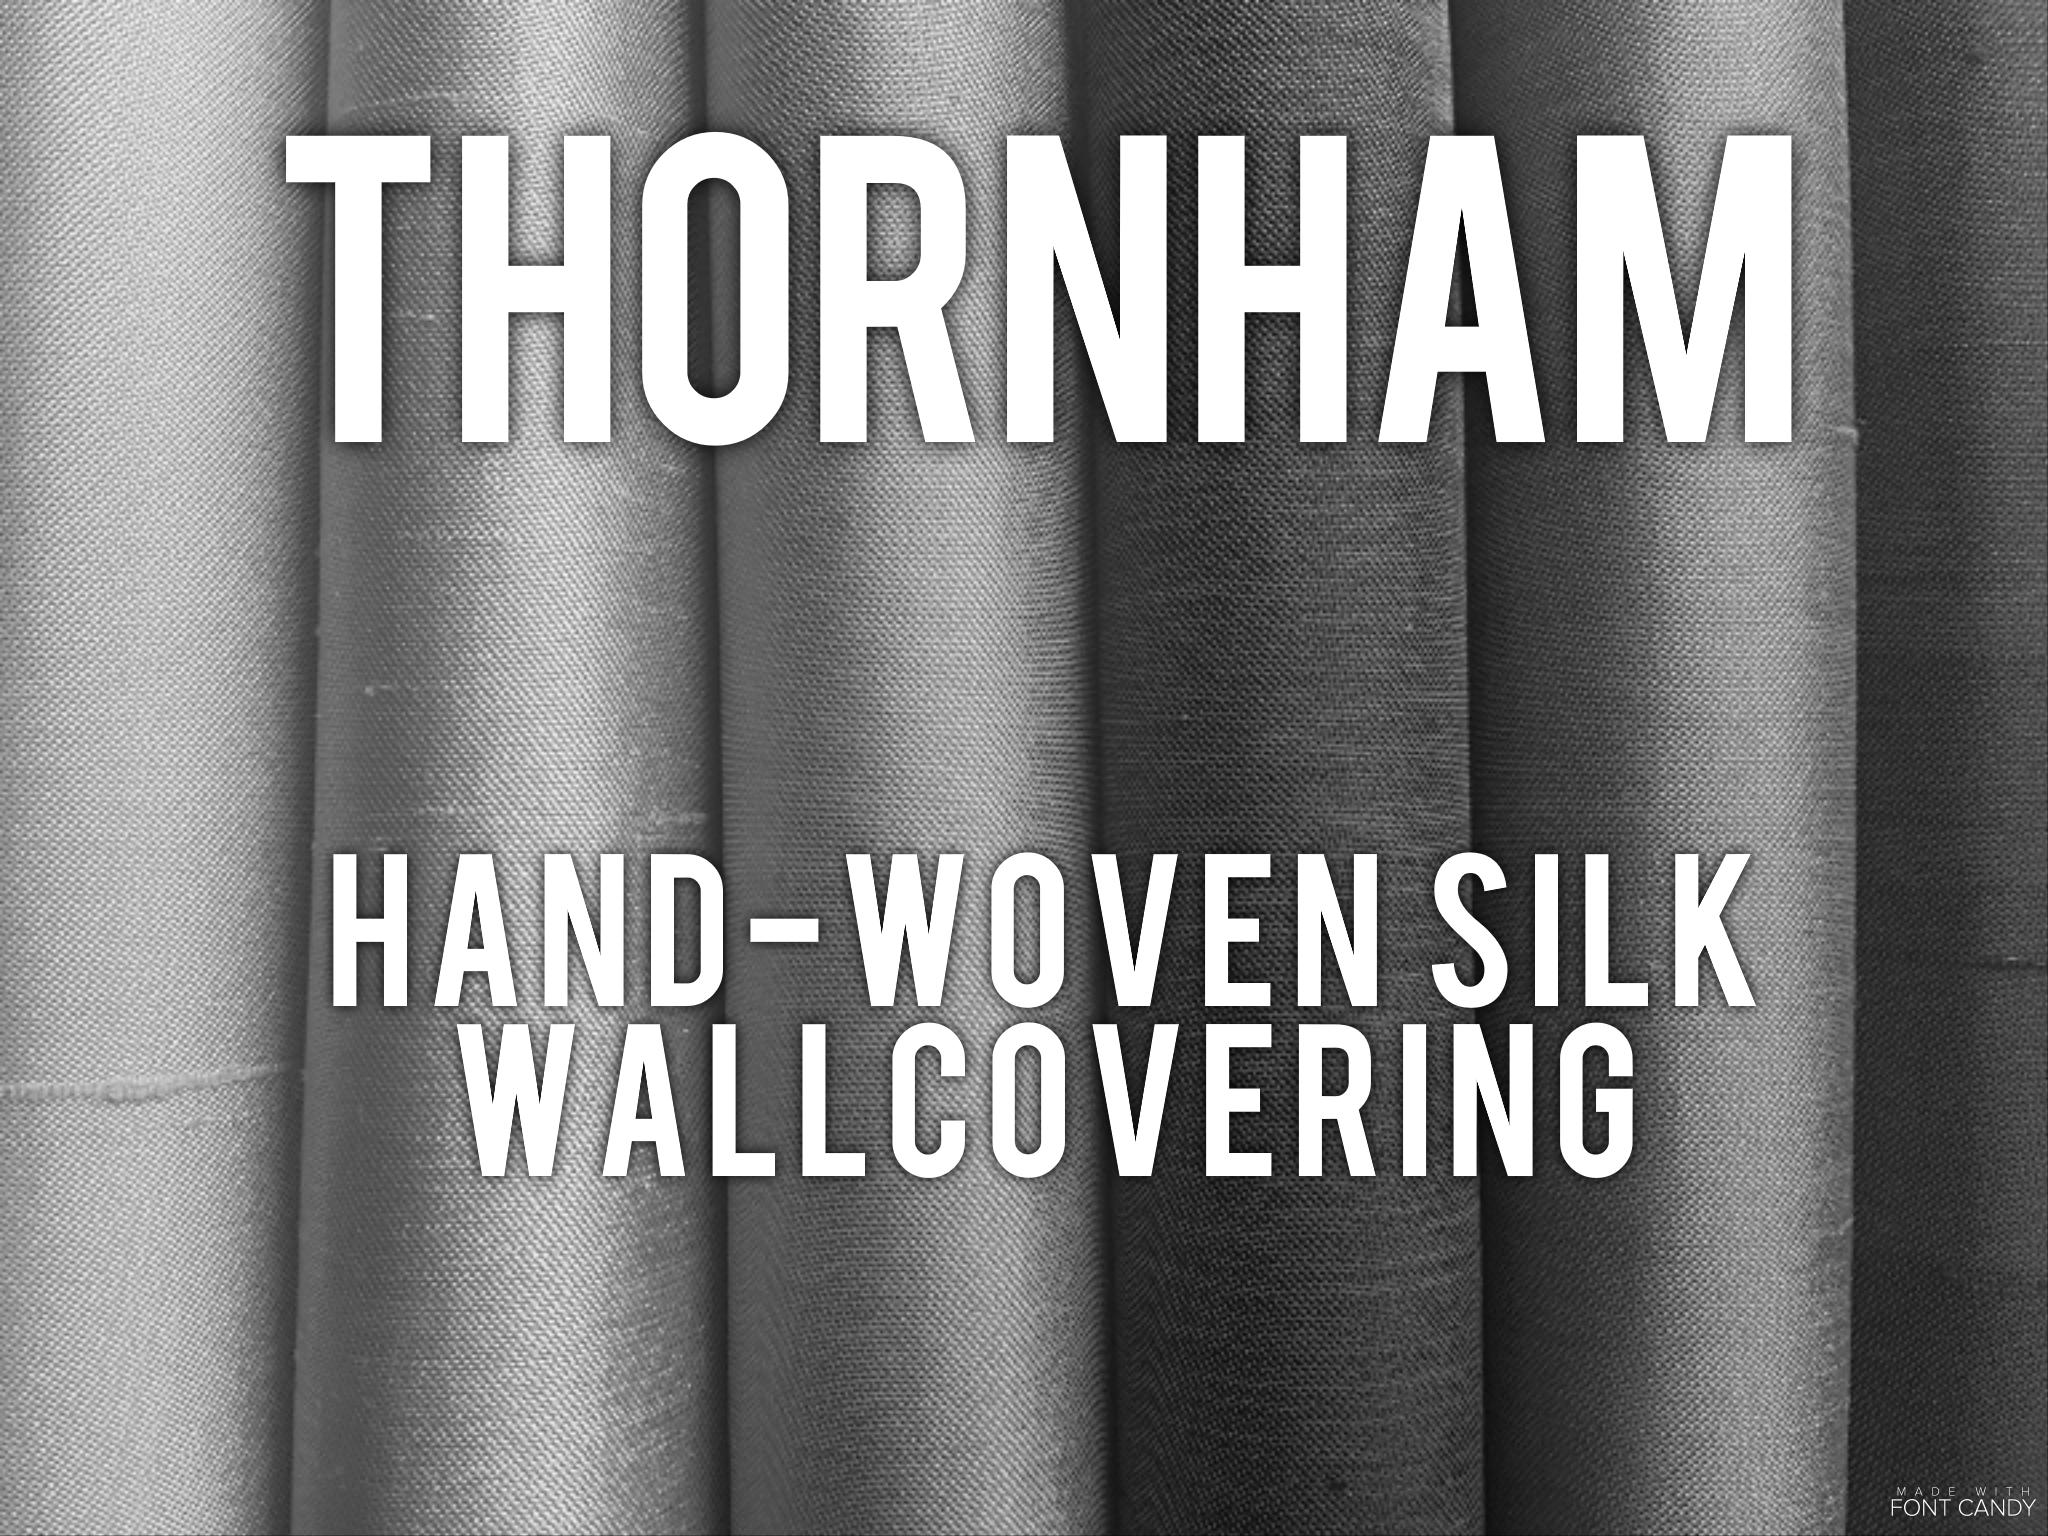 Thornham - Hand-woven silk wallcovering